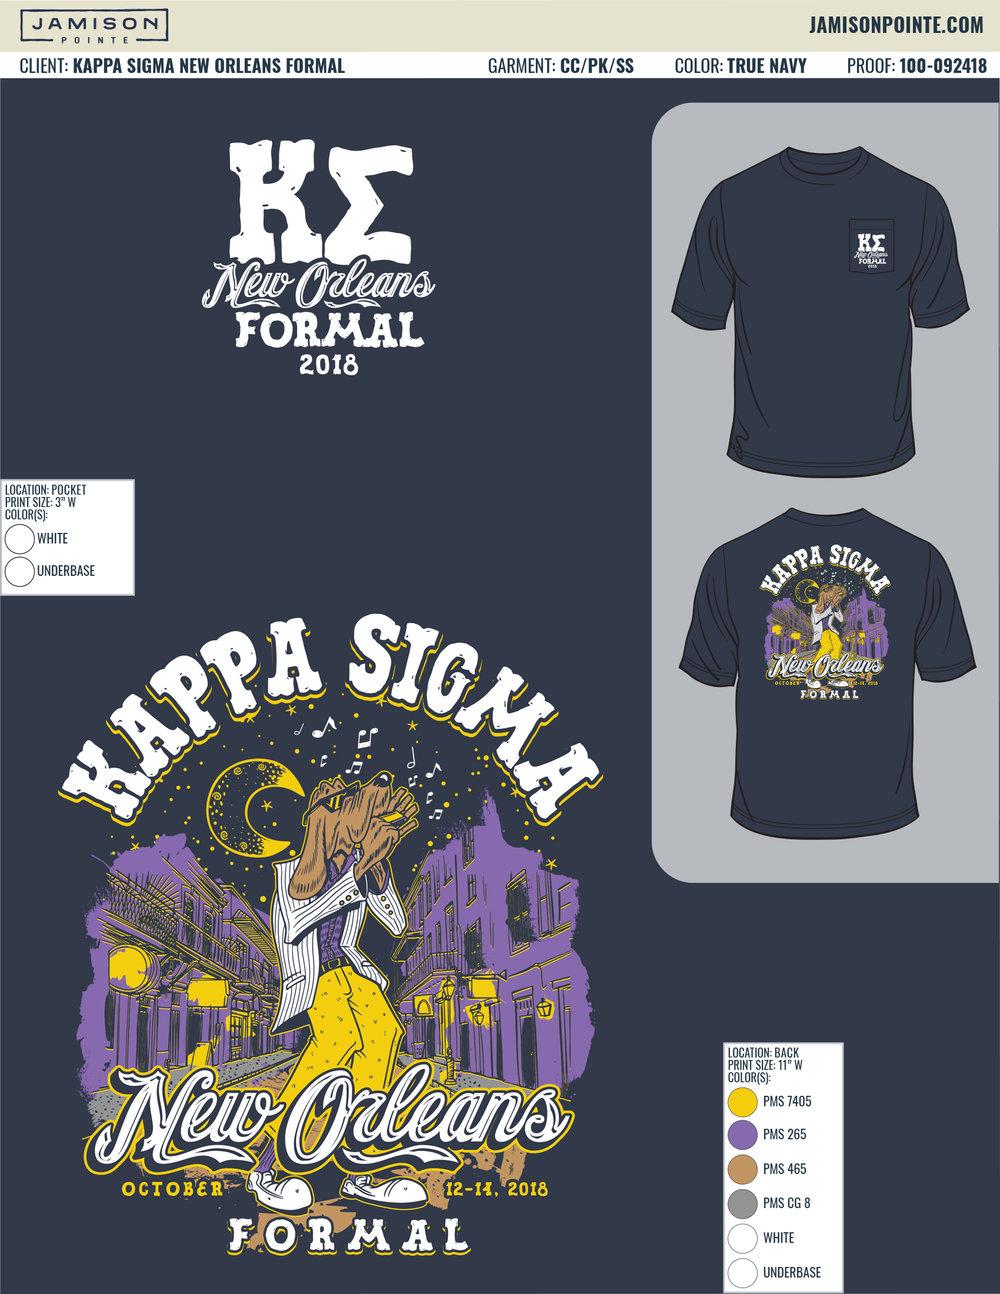 100-092418 Kappa Sigma New Orleans Formal.jpg